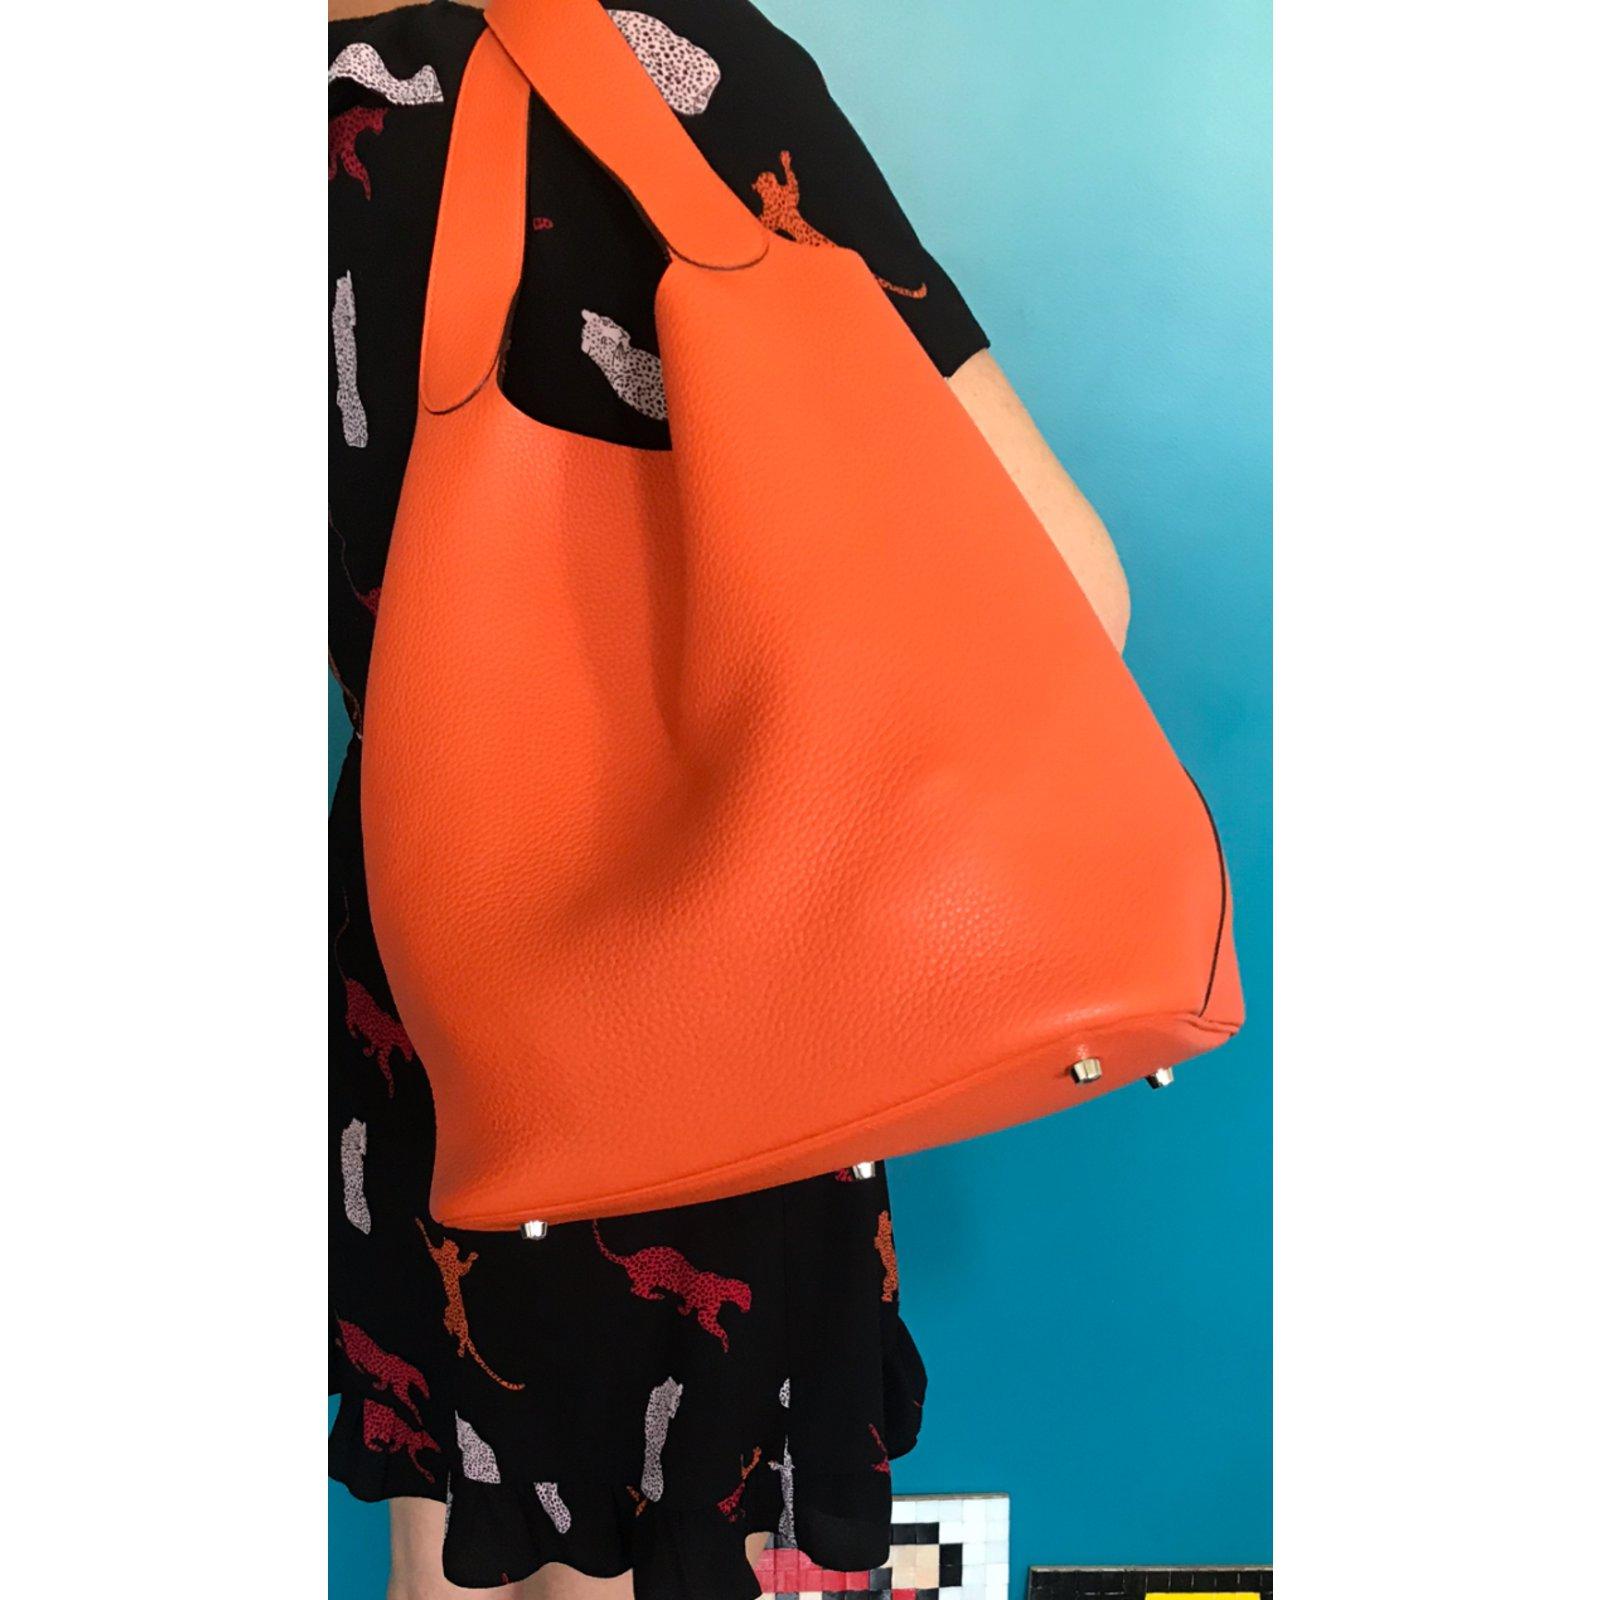 41cb31f45a Facebook · Pin This. Hermès Picotin Handbags Leather Orange ...